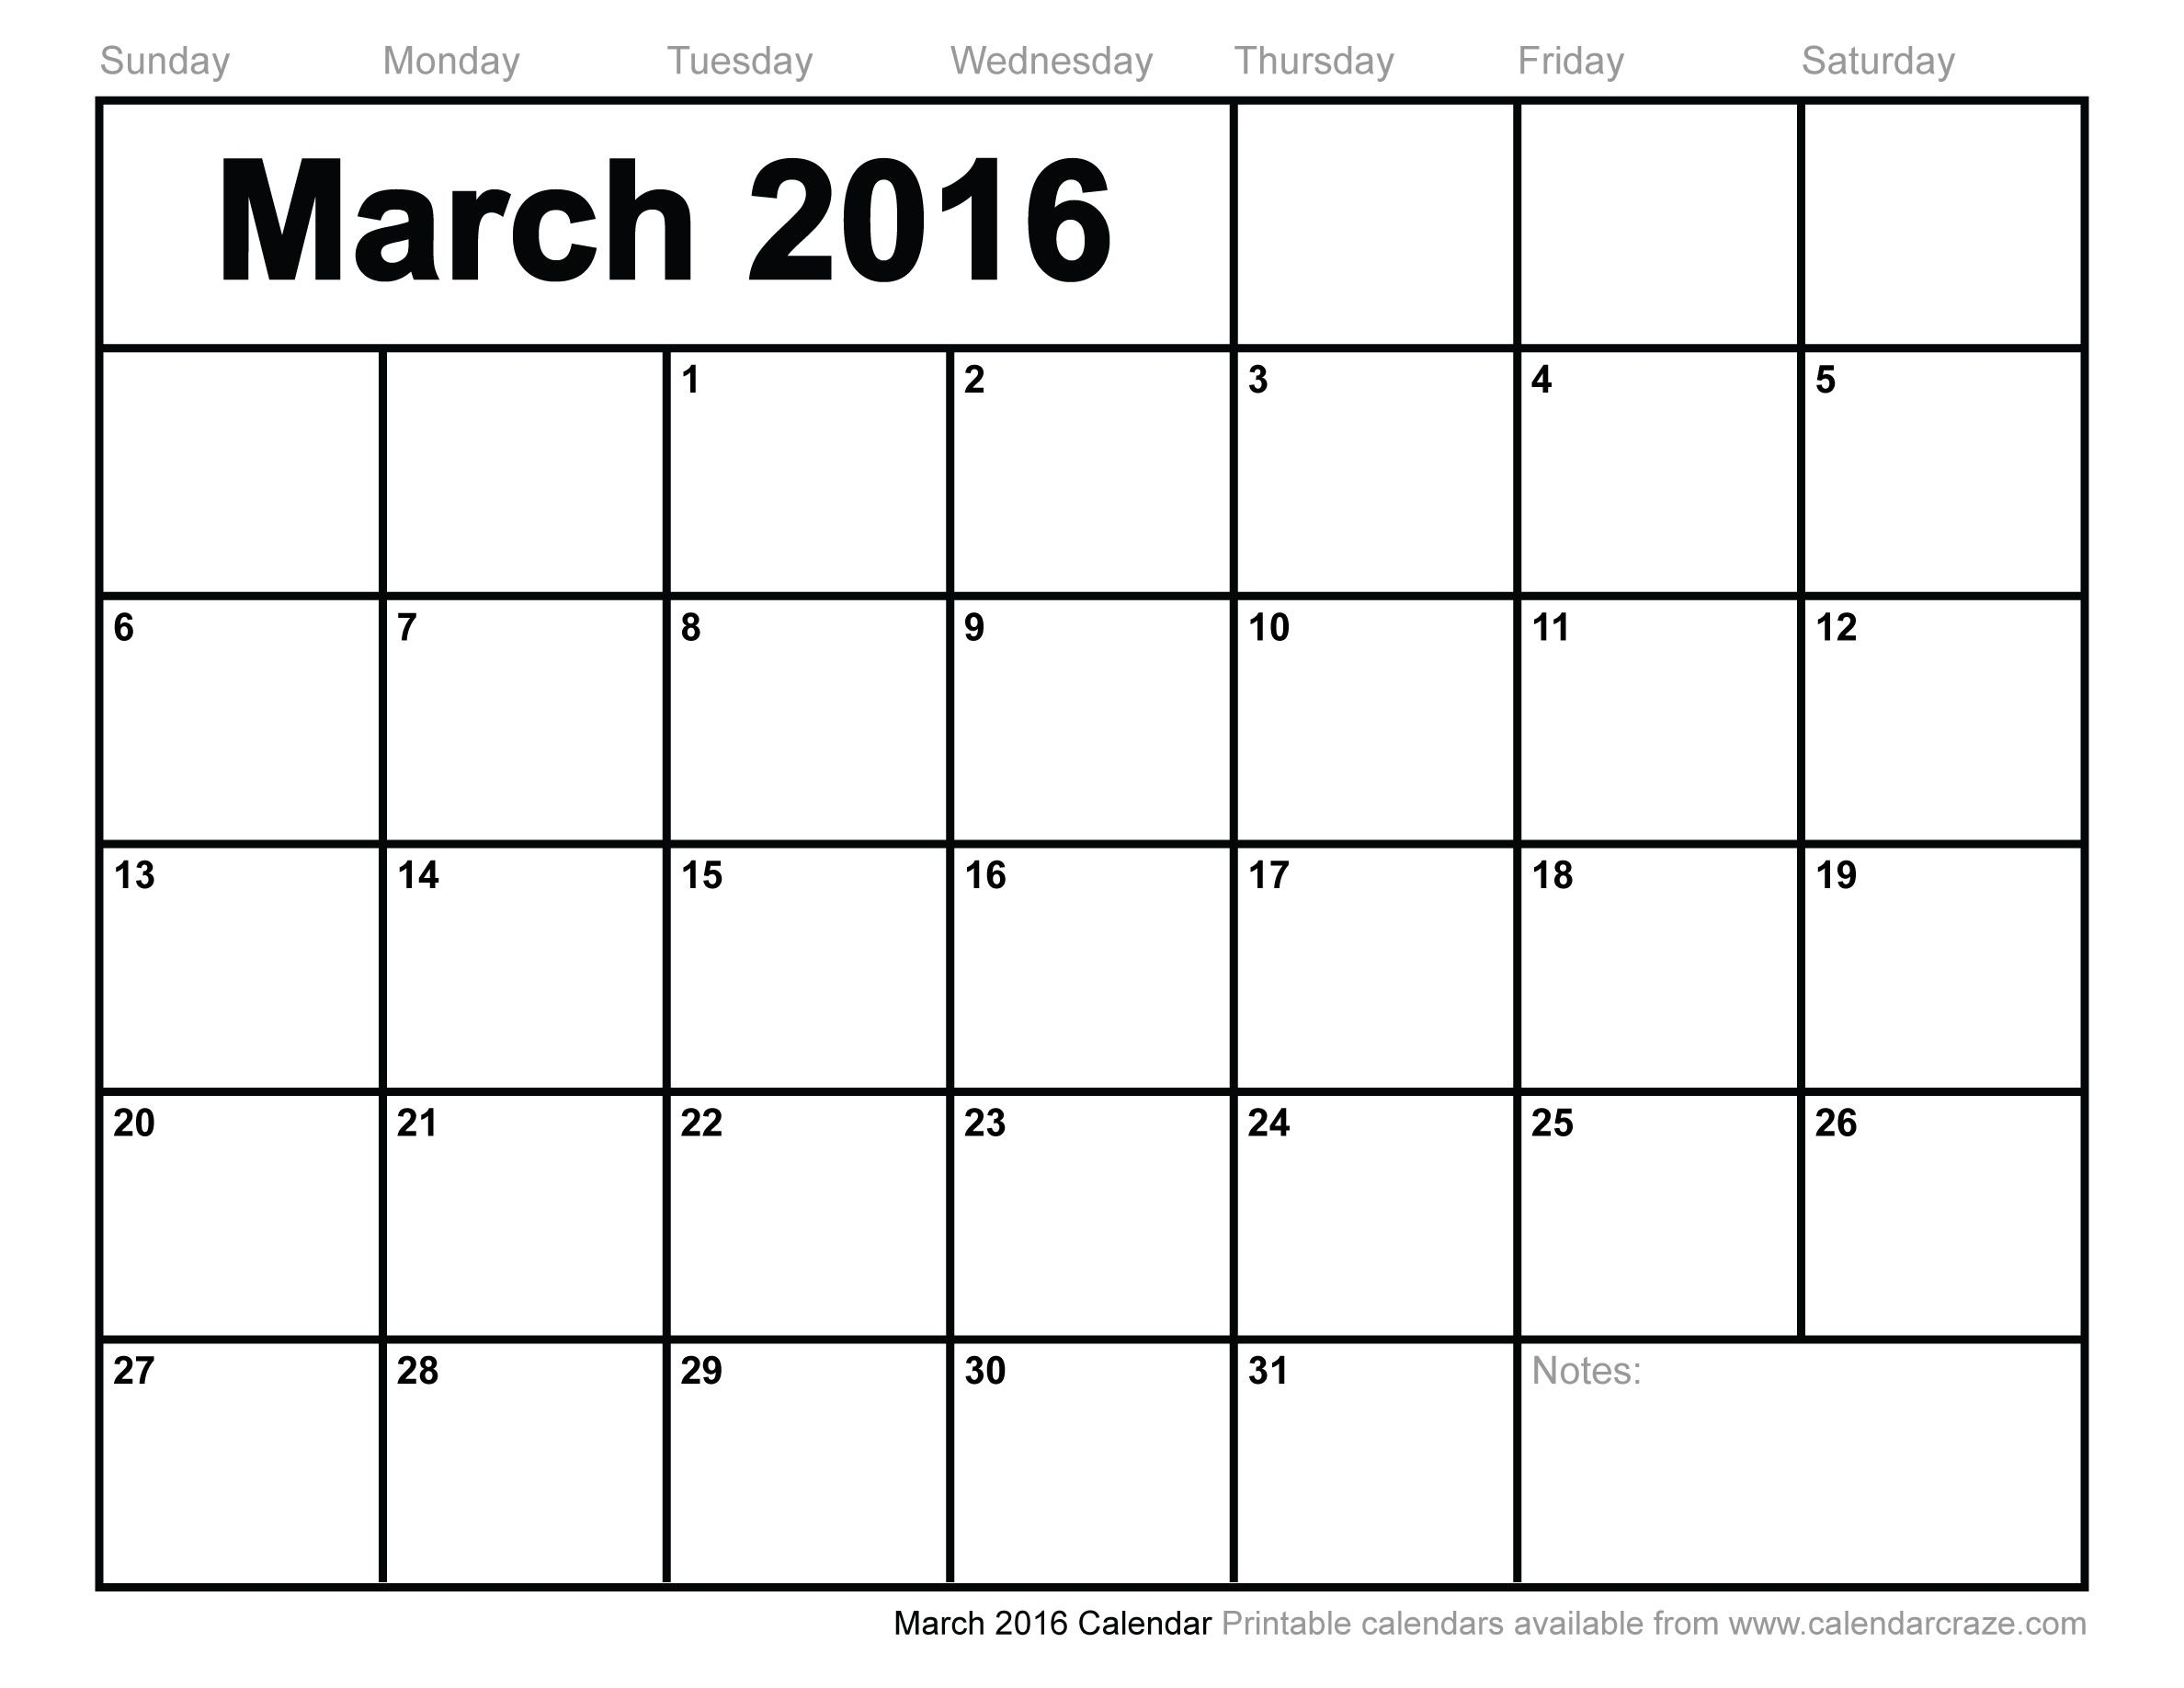 Mar 2016 Calendar Printable Pdf – Google Search Blank Calendars To Fill In Online